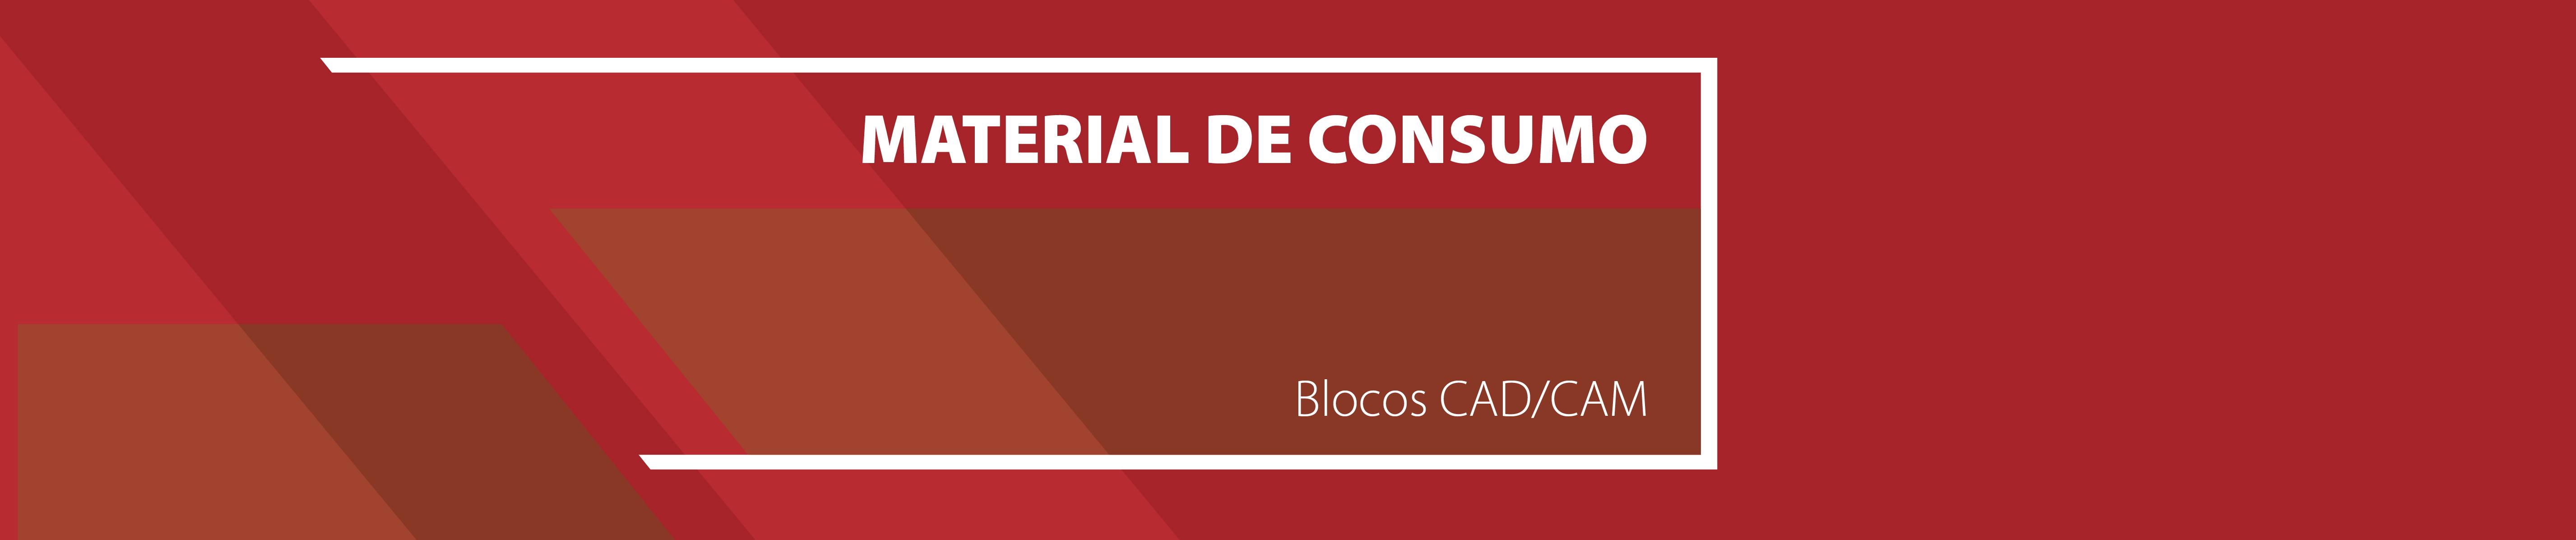 Blocos CAD/CAM